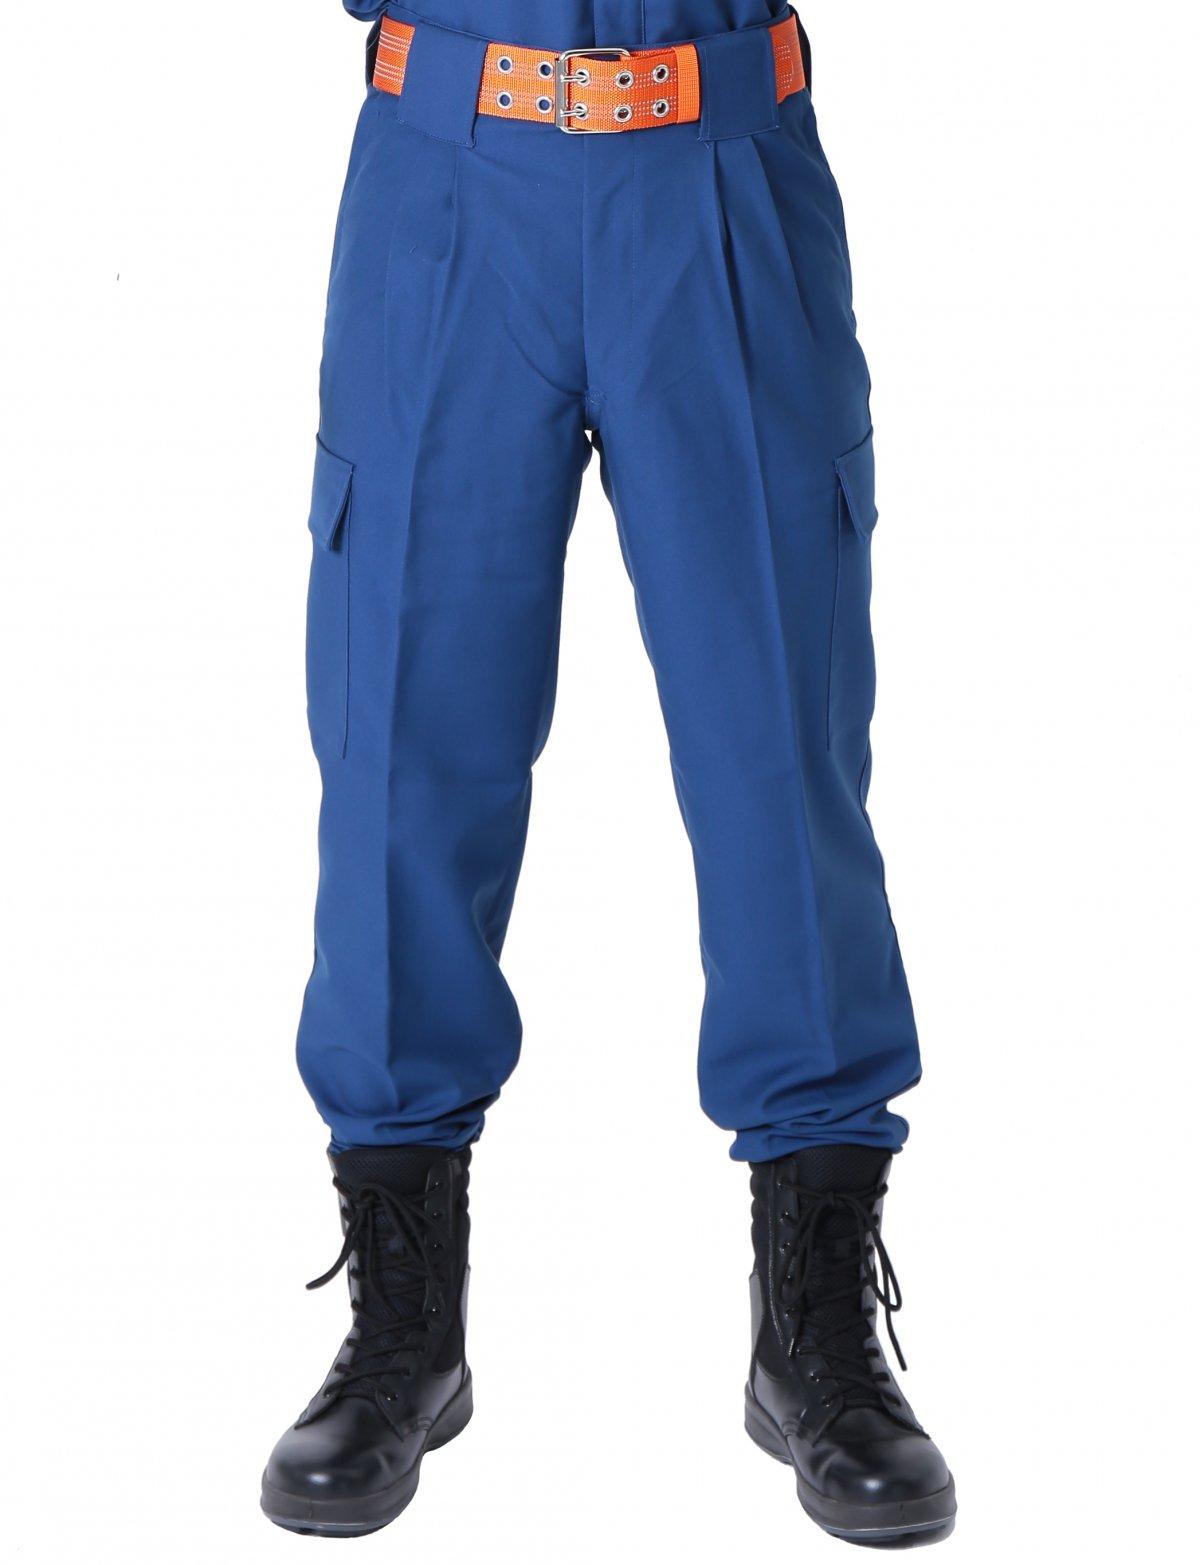 ST消防活動服 ズボン